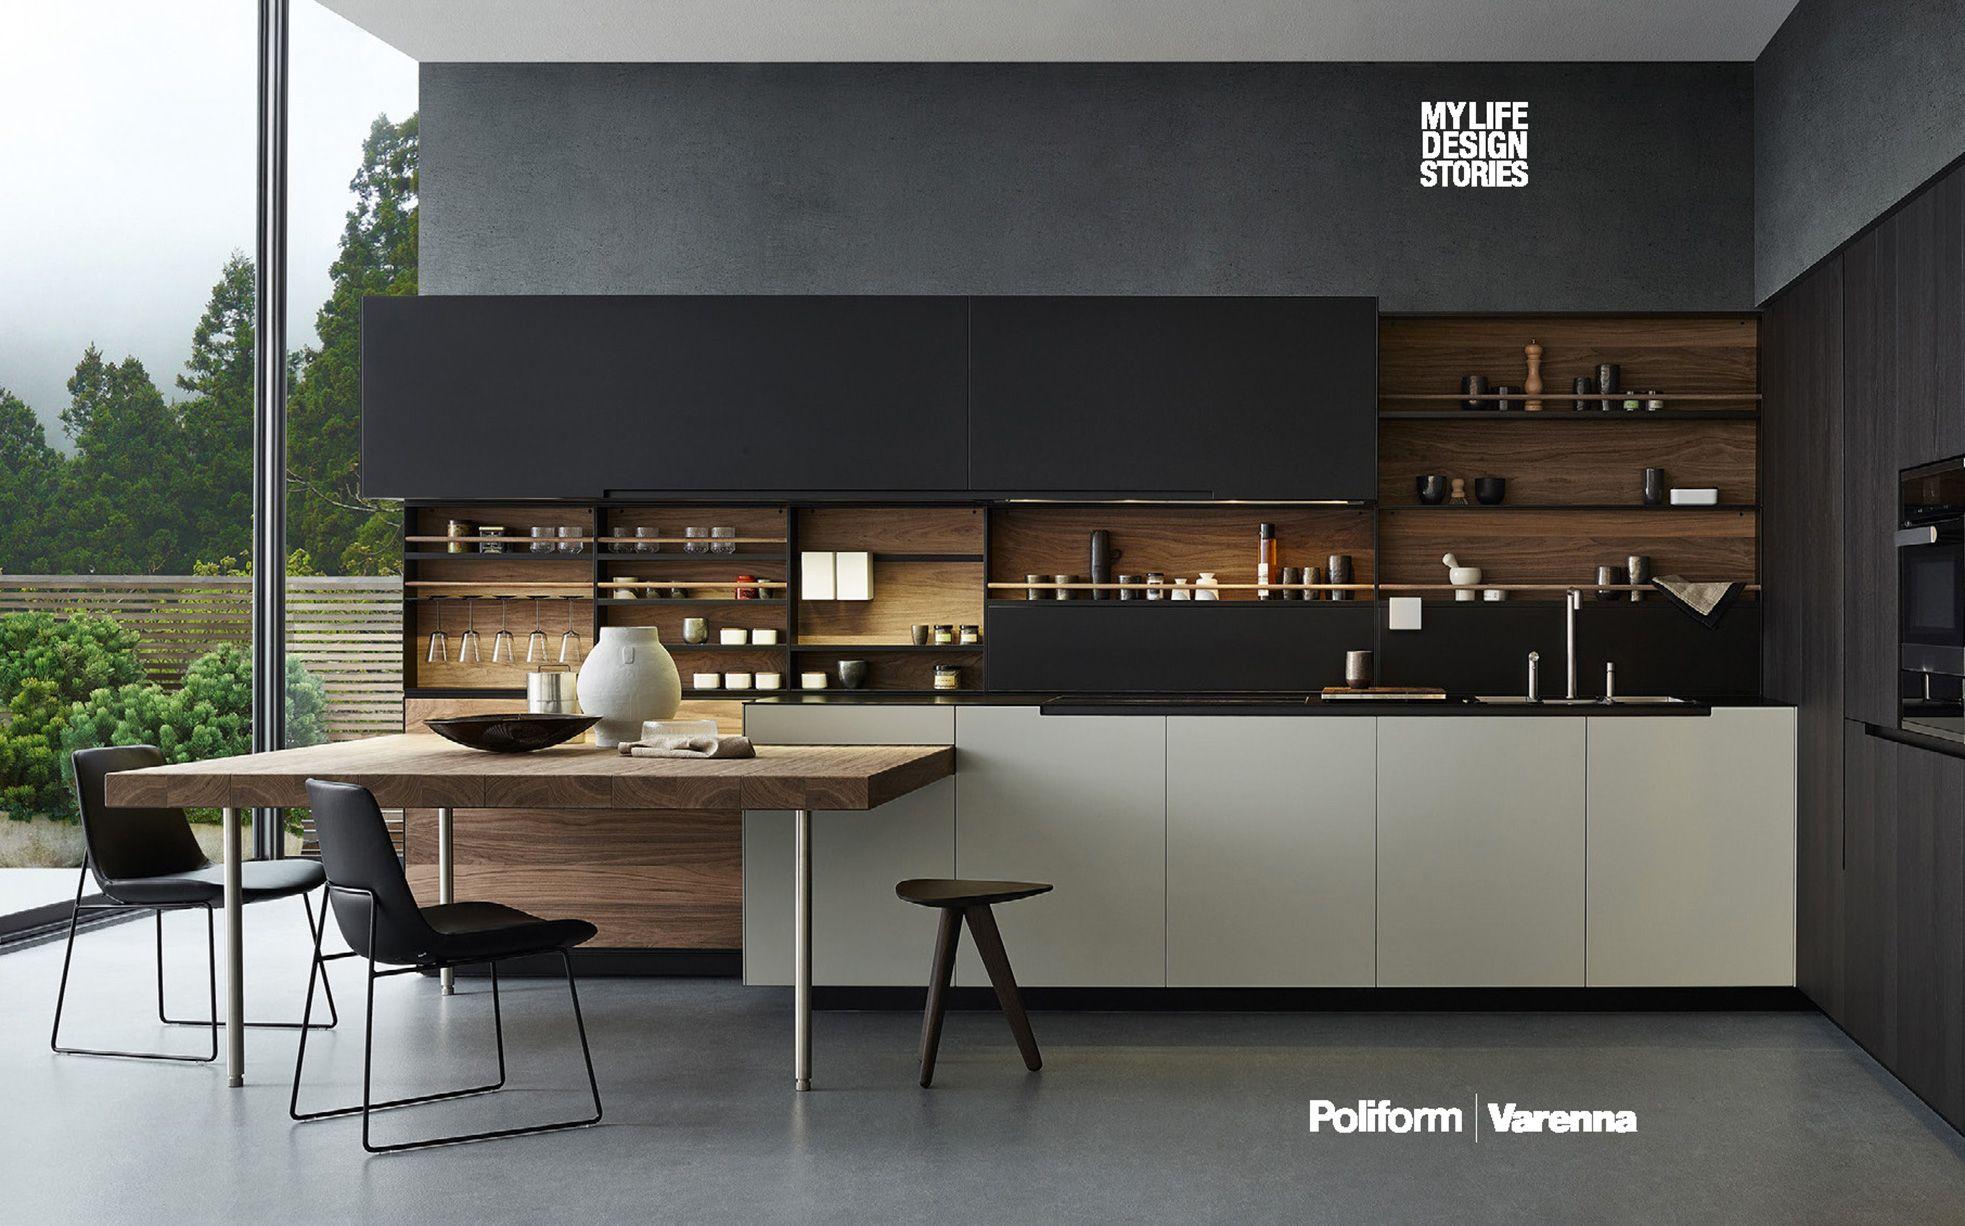 poliform varenna cucine - Google Search   villa inspiration   Pinterest